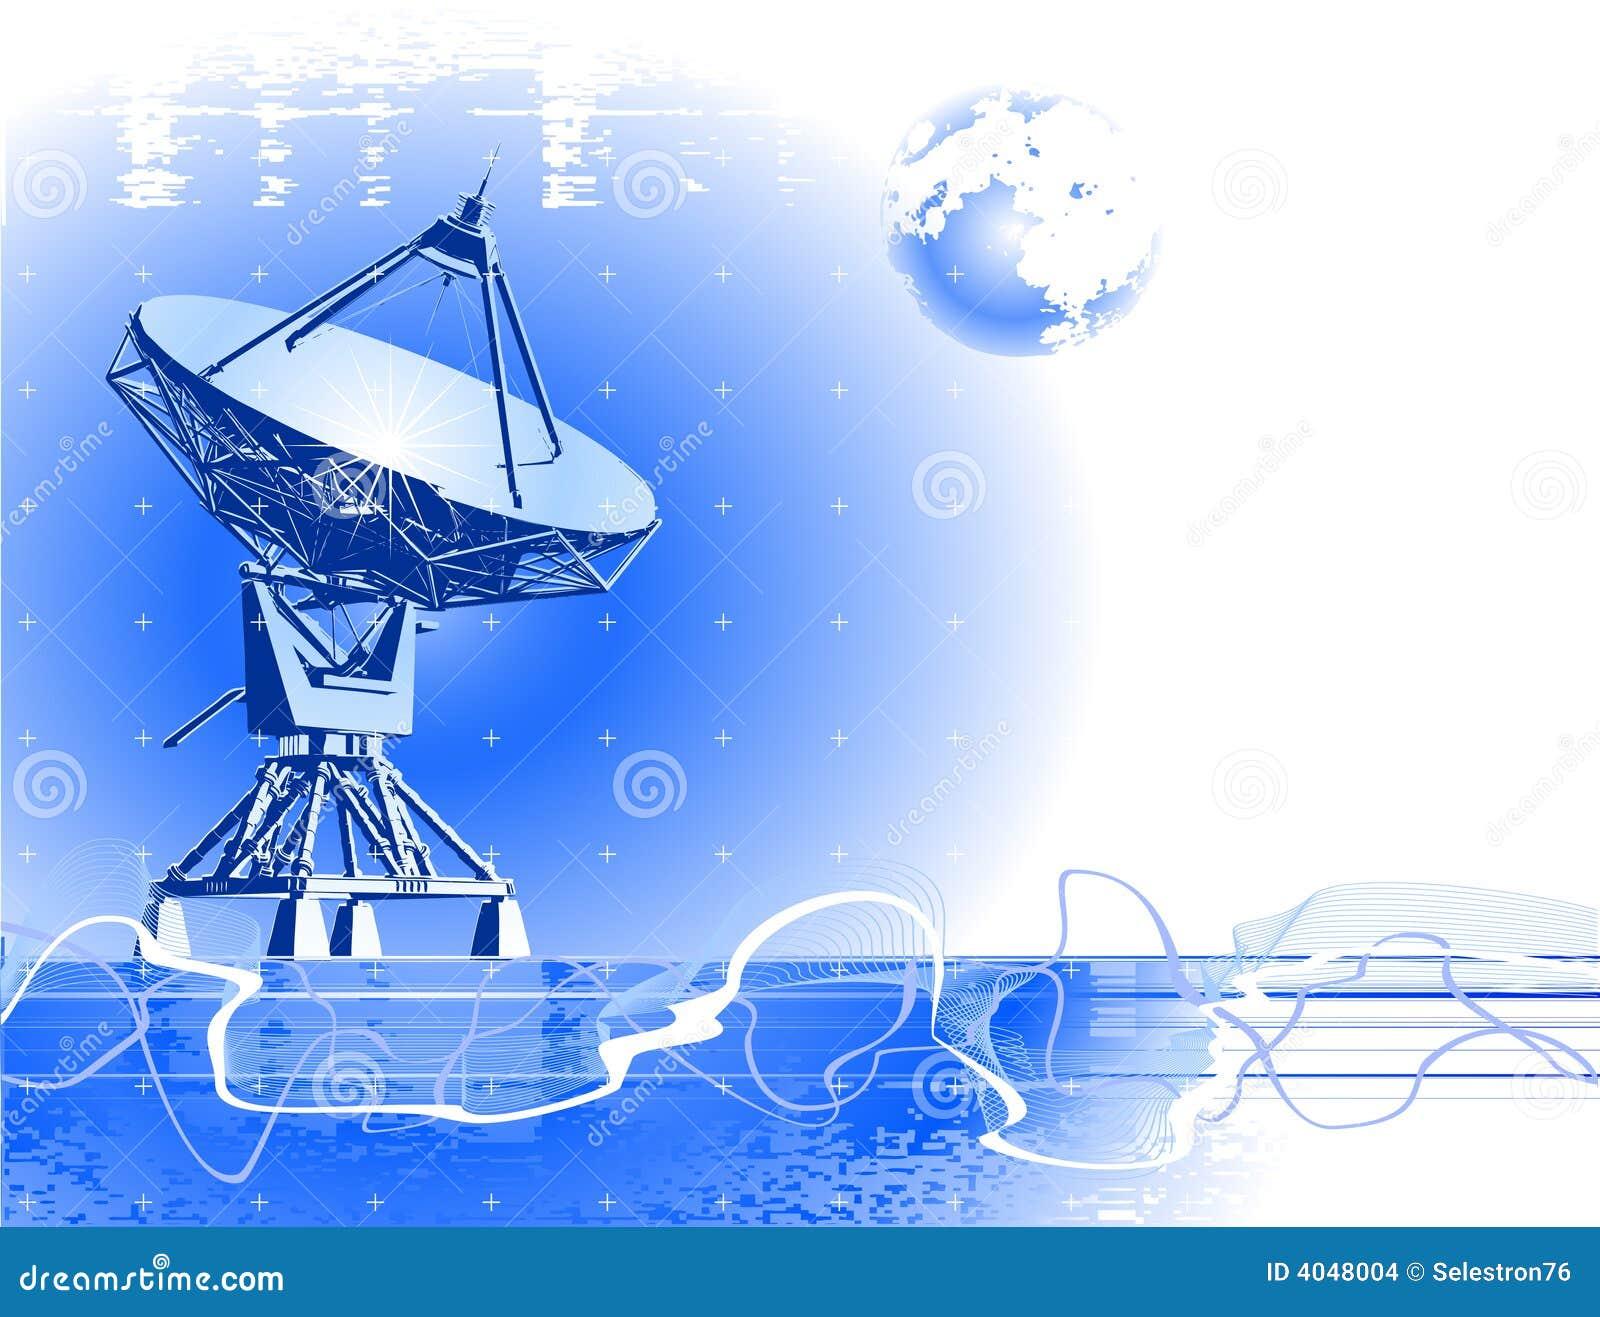 Antena de pratos satélites